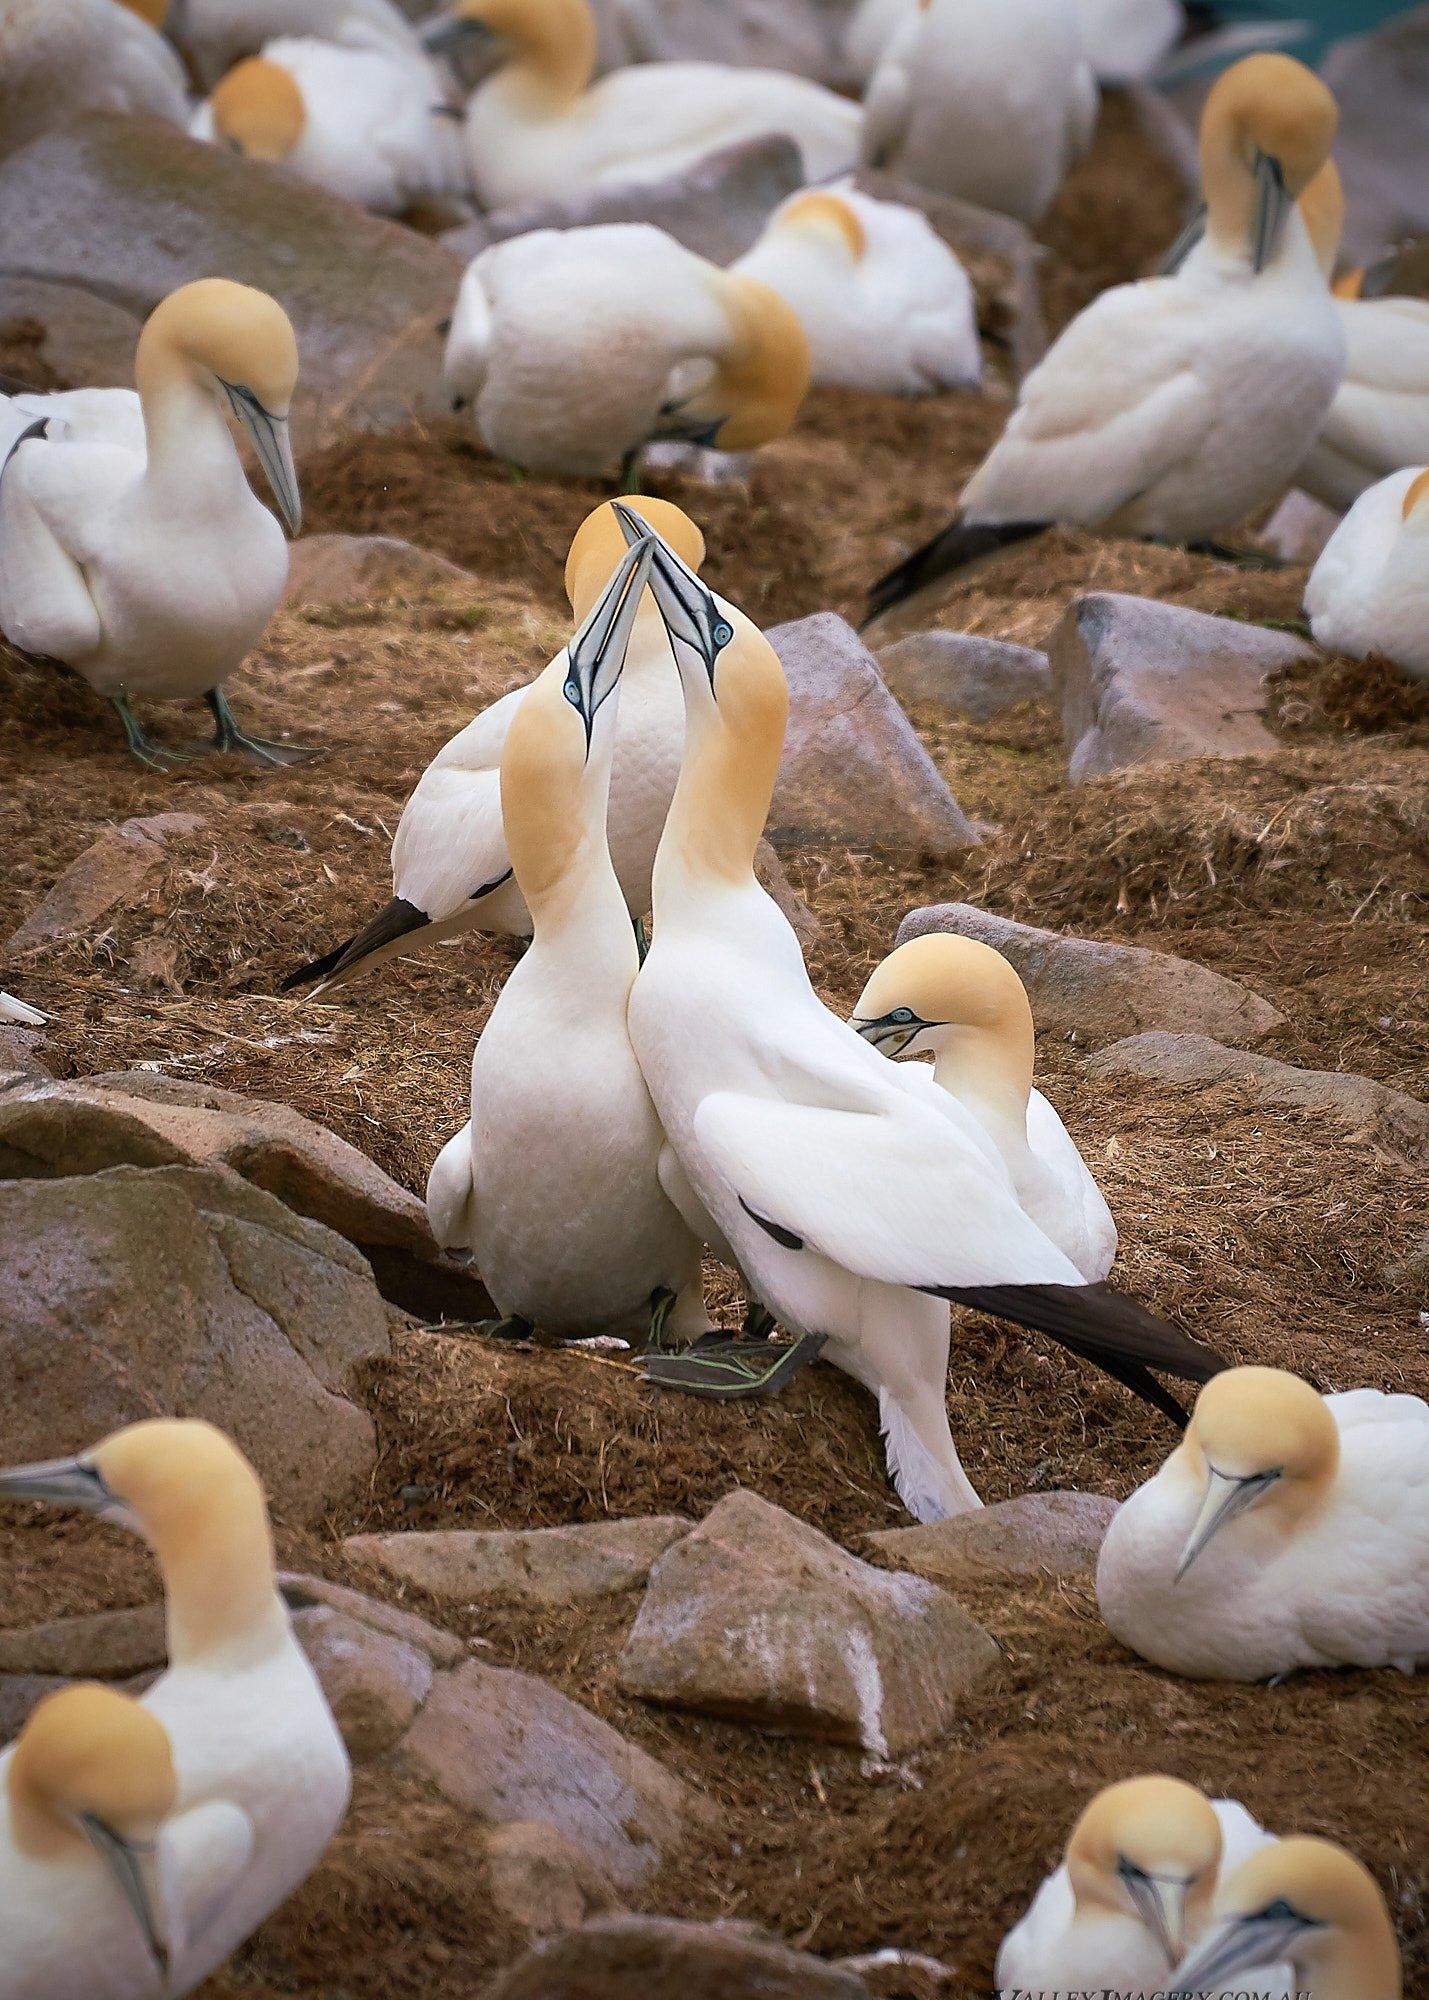 Gannets at St Brides, Newfoundland, Canada